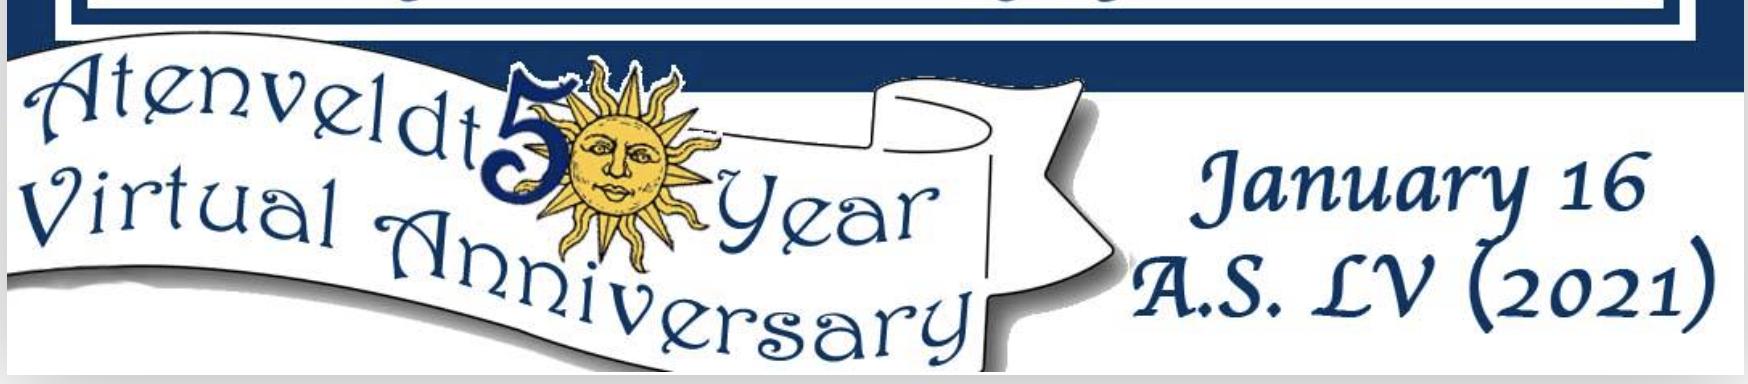 50 Year Celebrations Update!